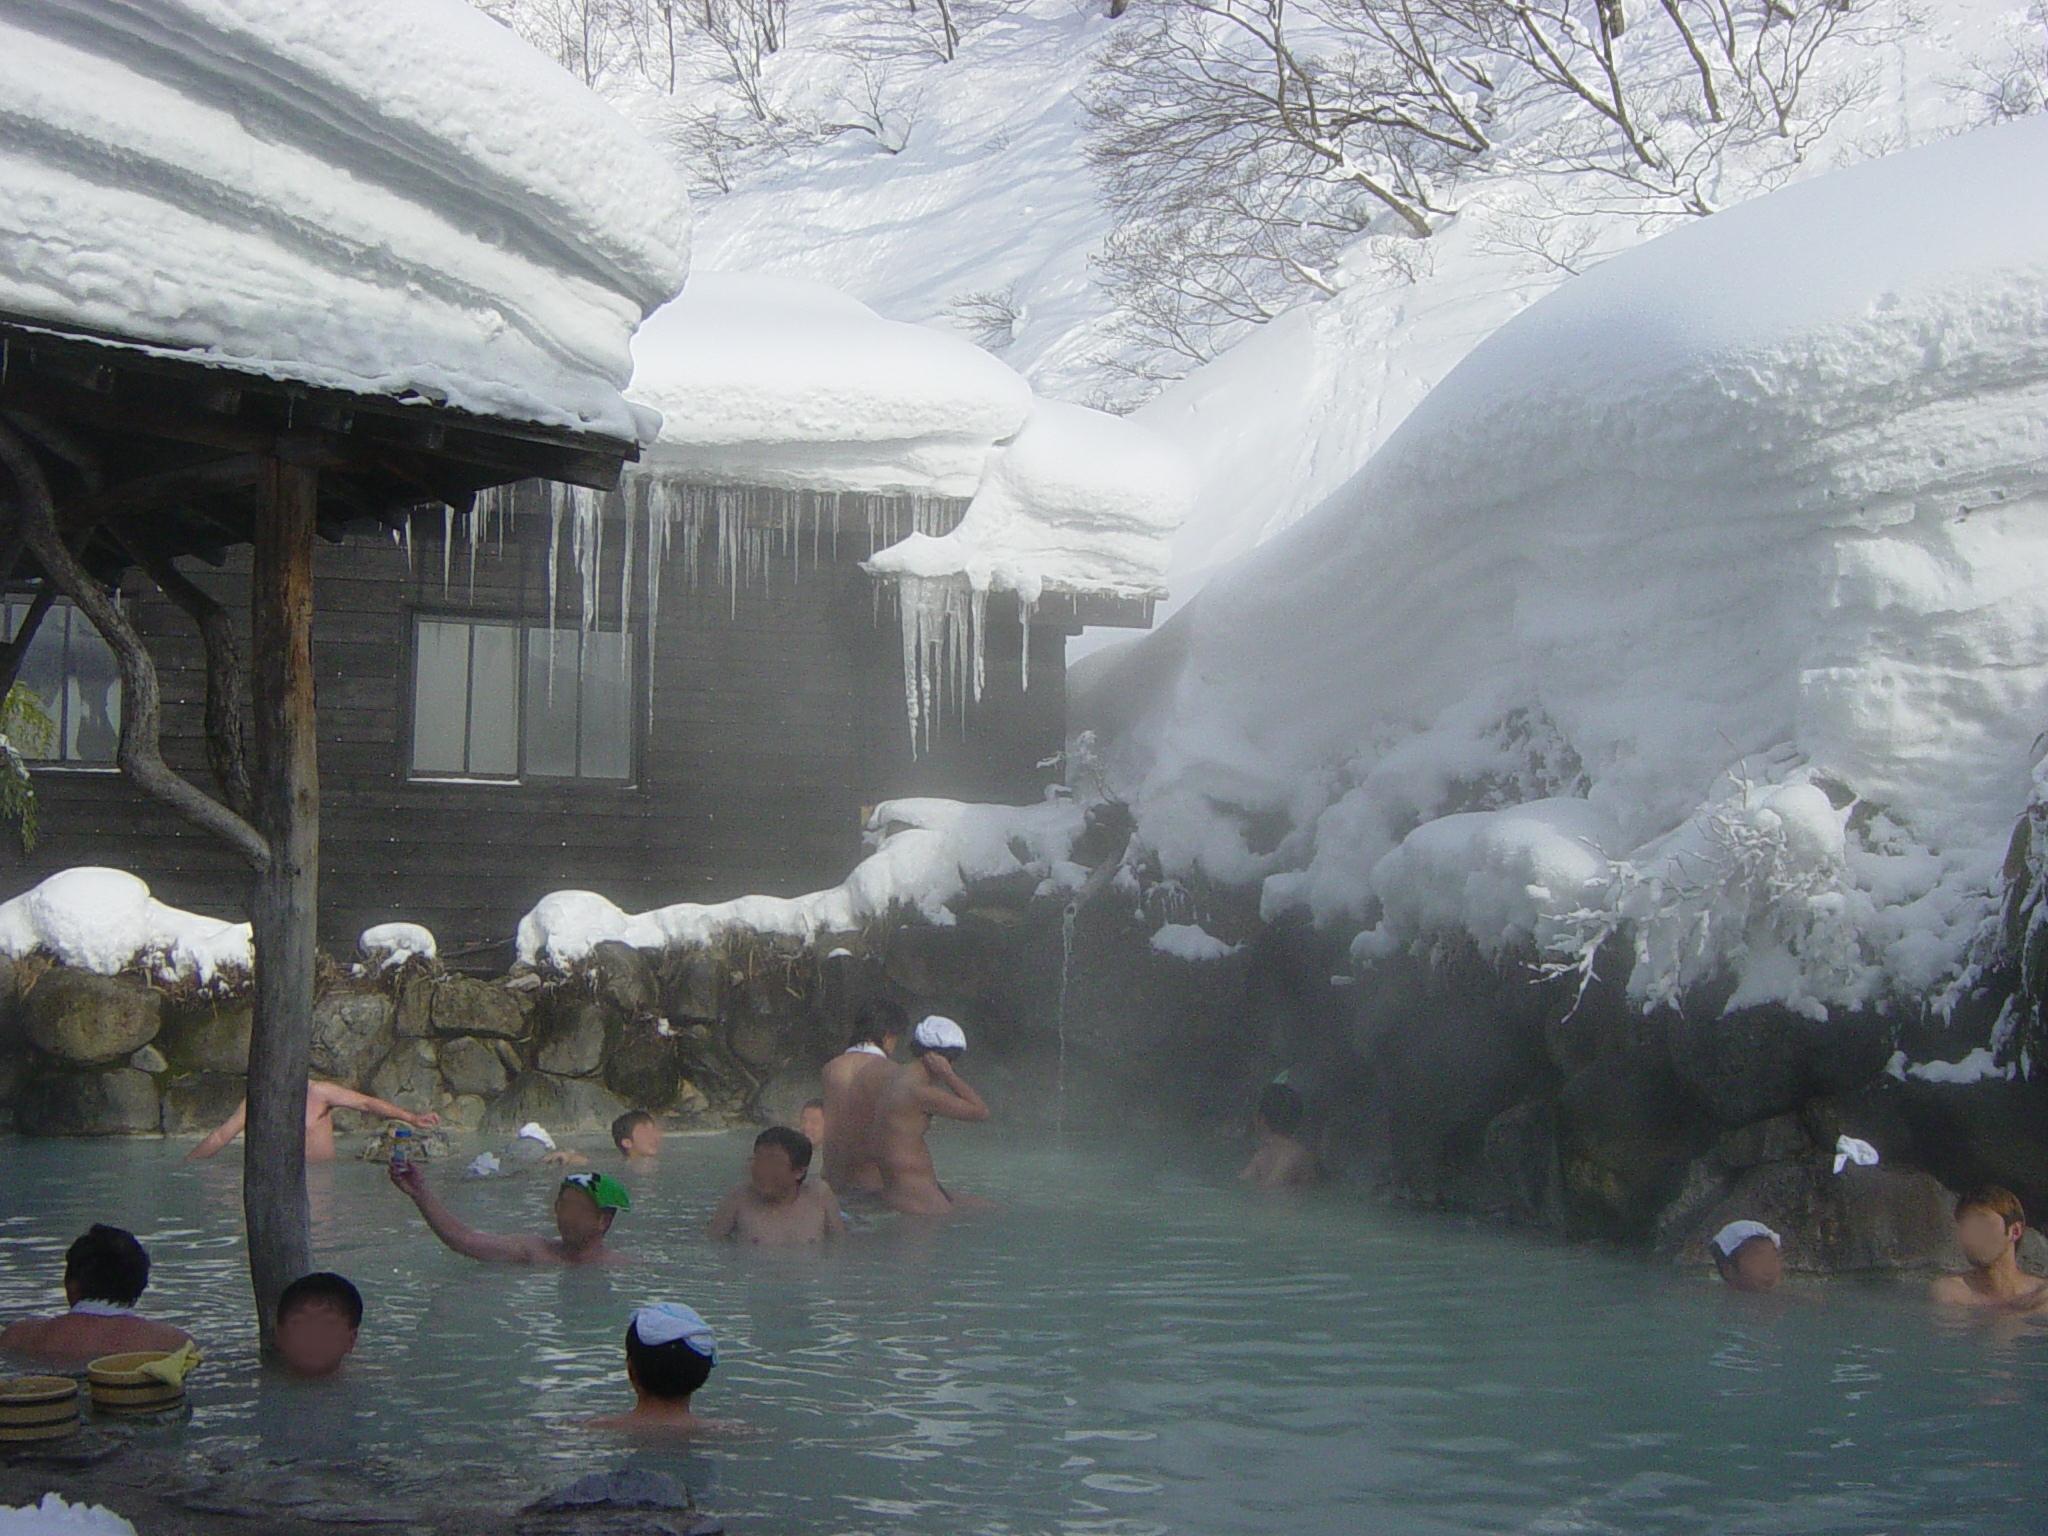 Conociendo las exquisitas aguas[ Lolindir y Raven] [OU-Sak]  Tsurunoyu_onsen_rotenburo2